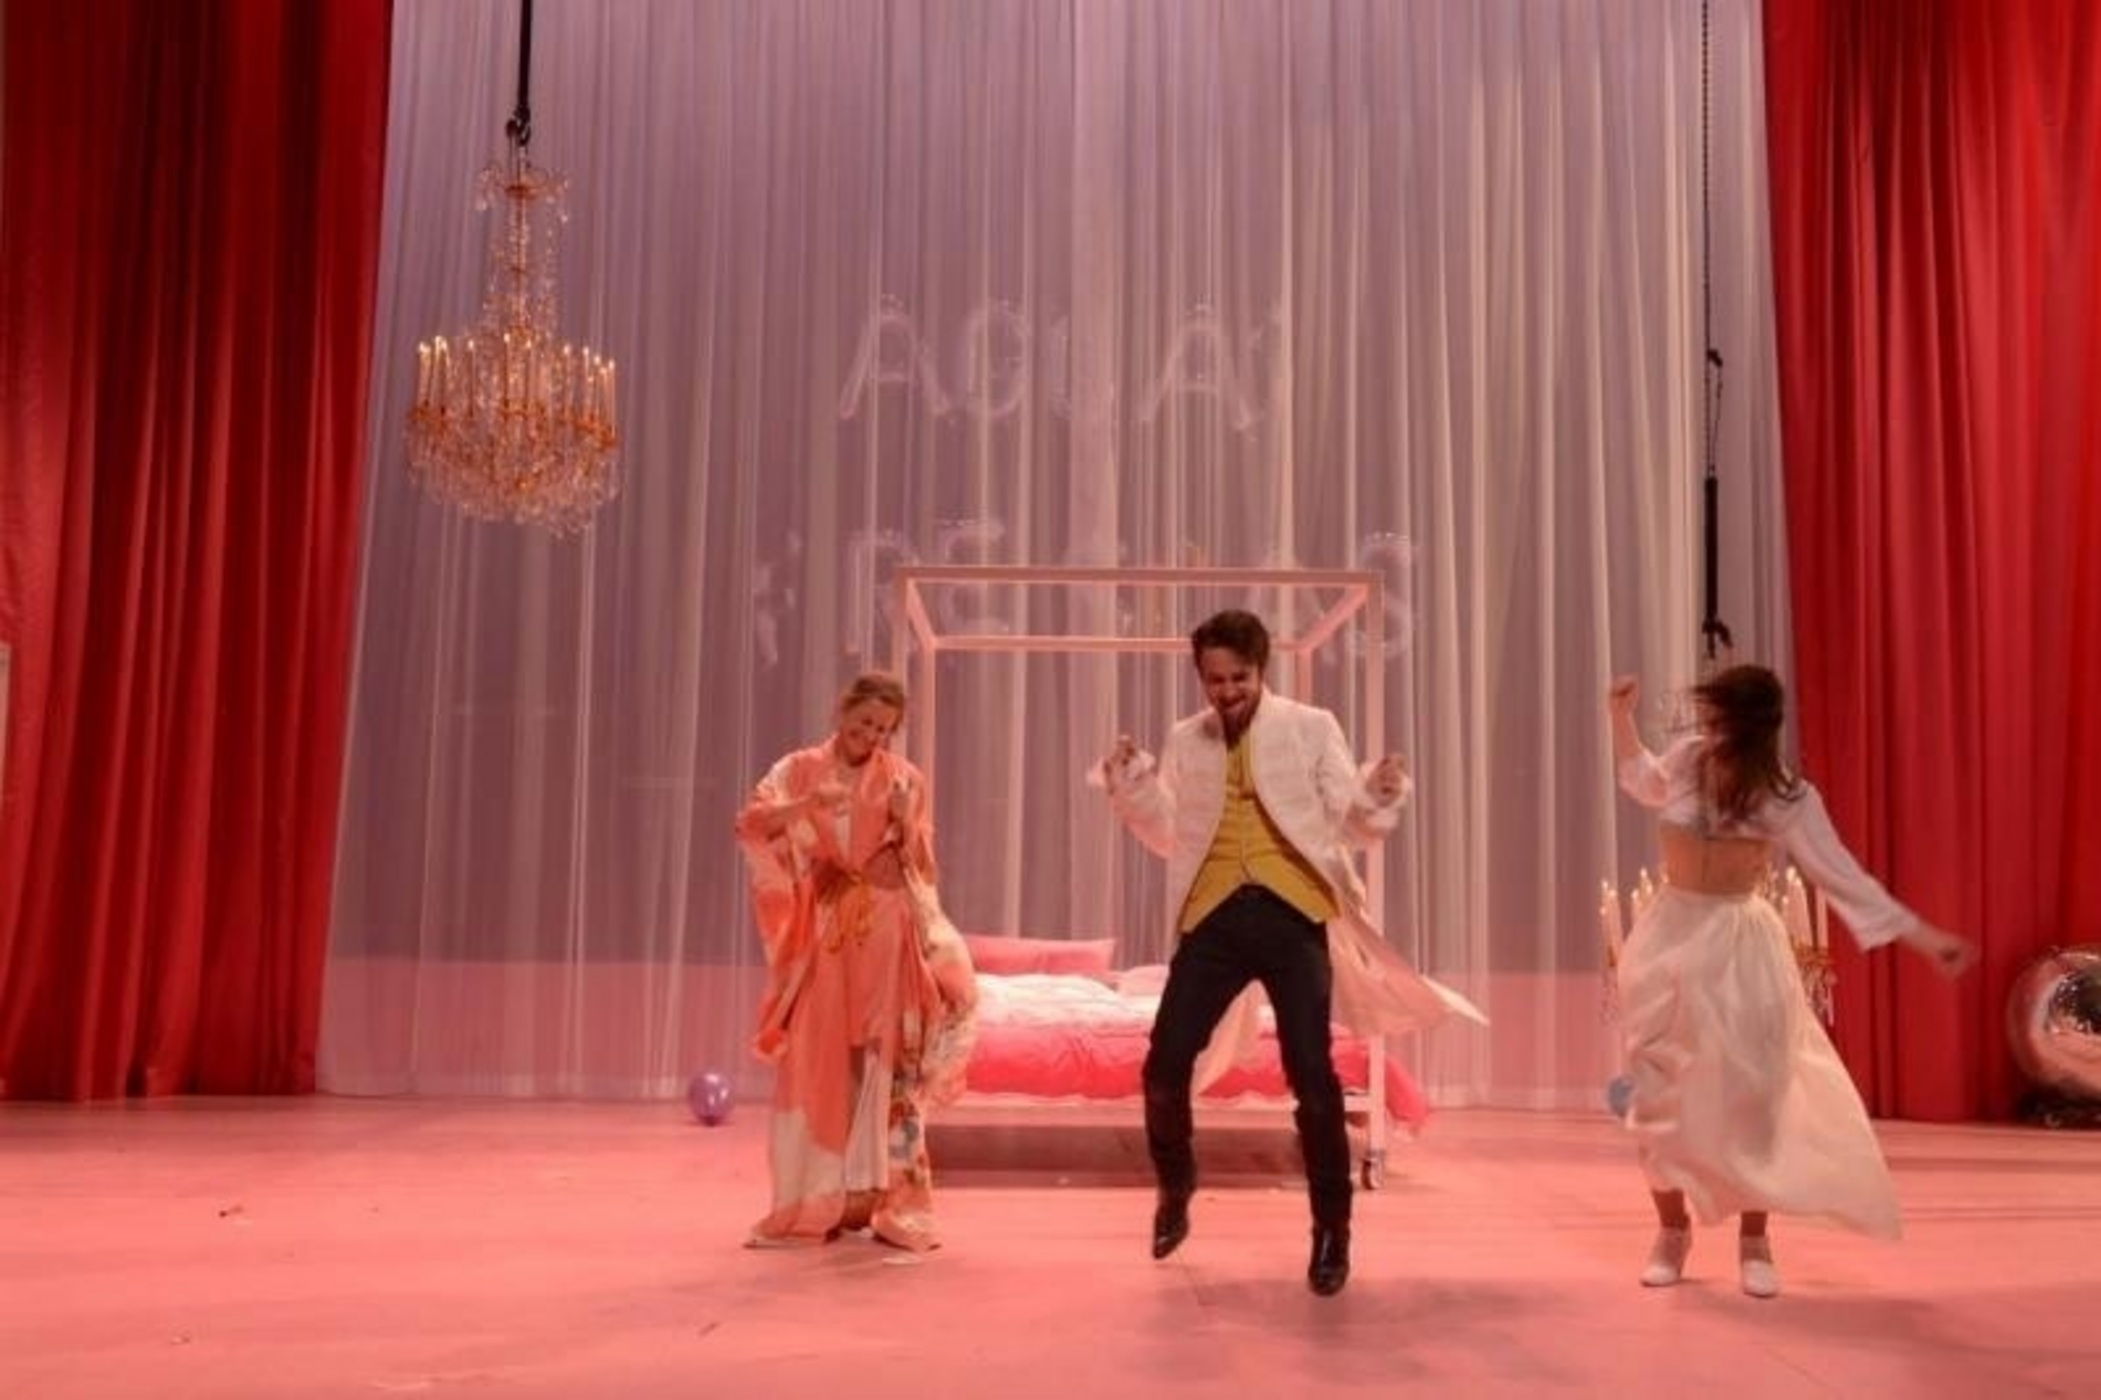 Classe Théatre : Le mariage de Figaro